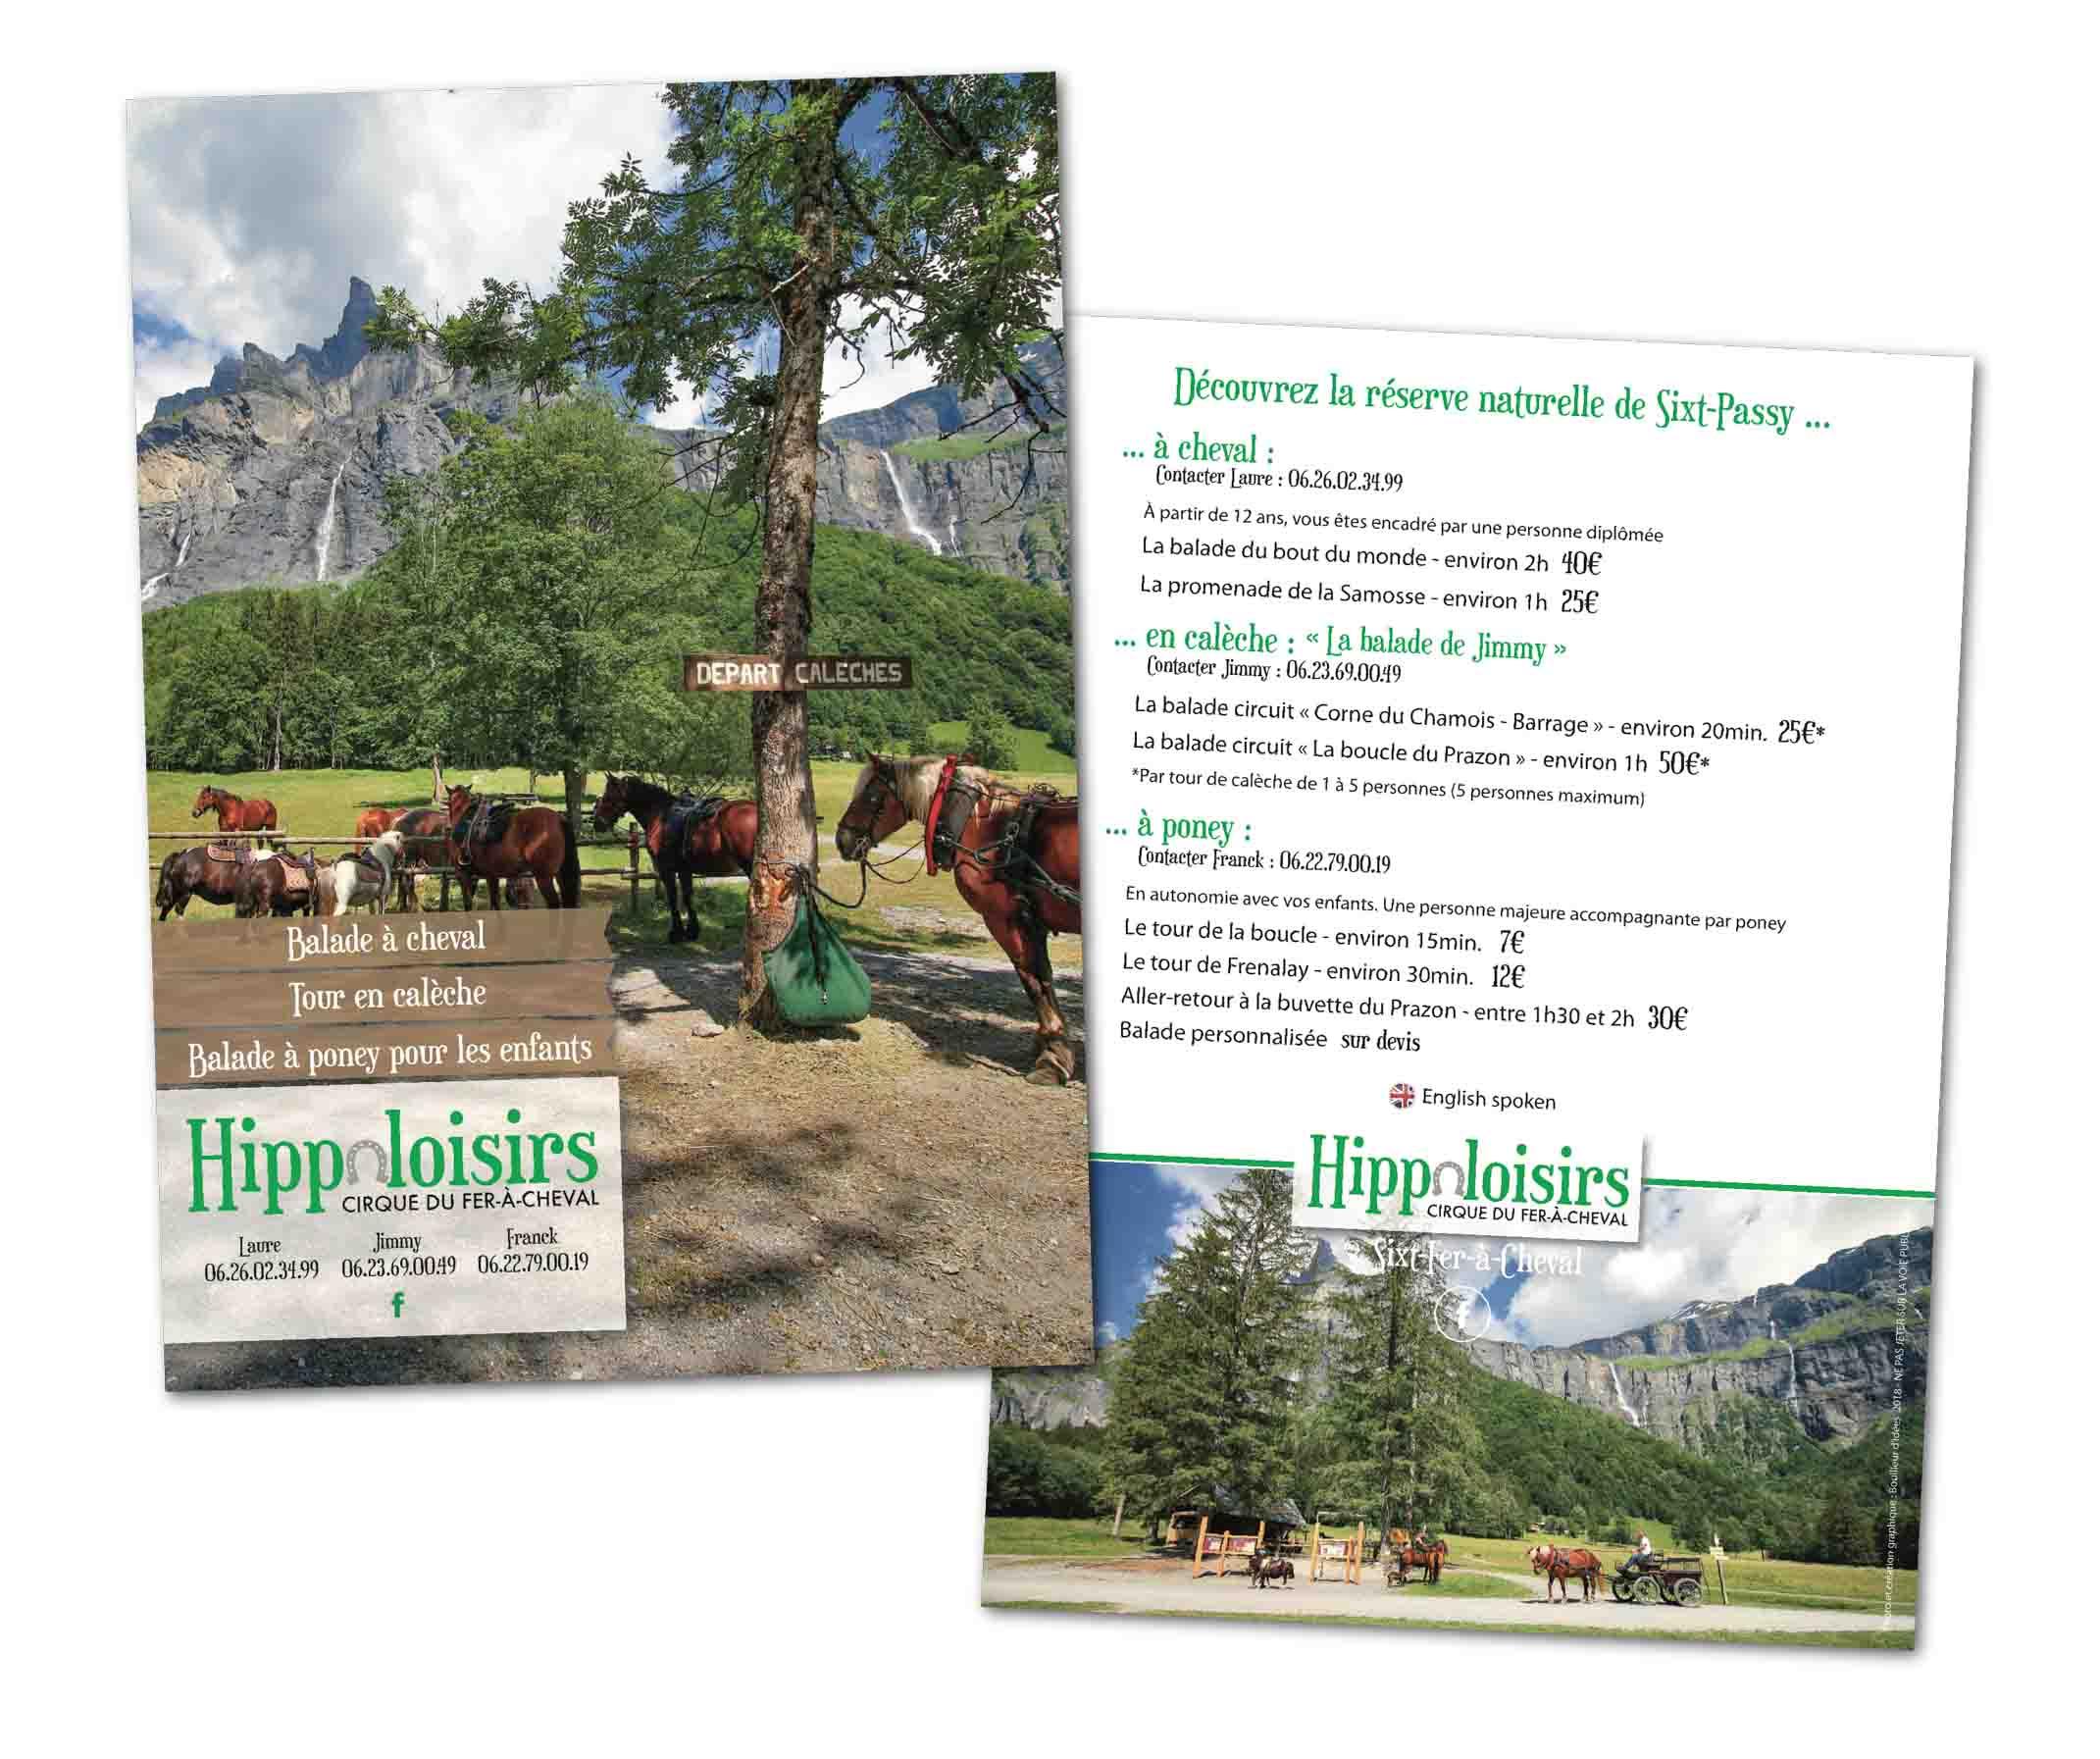 Image flyer Hippoloisirs